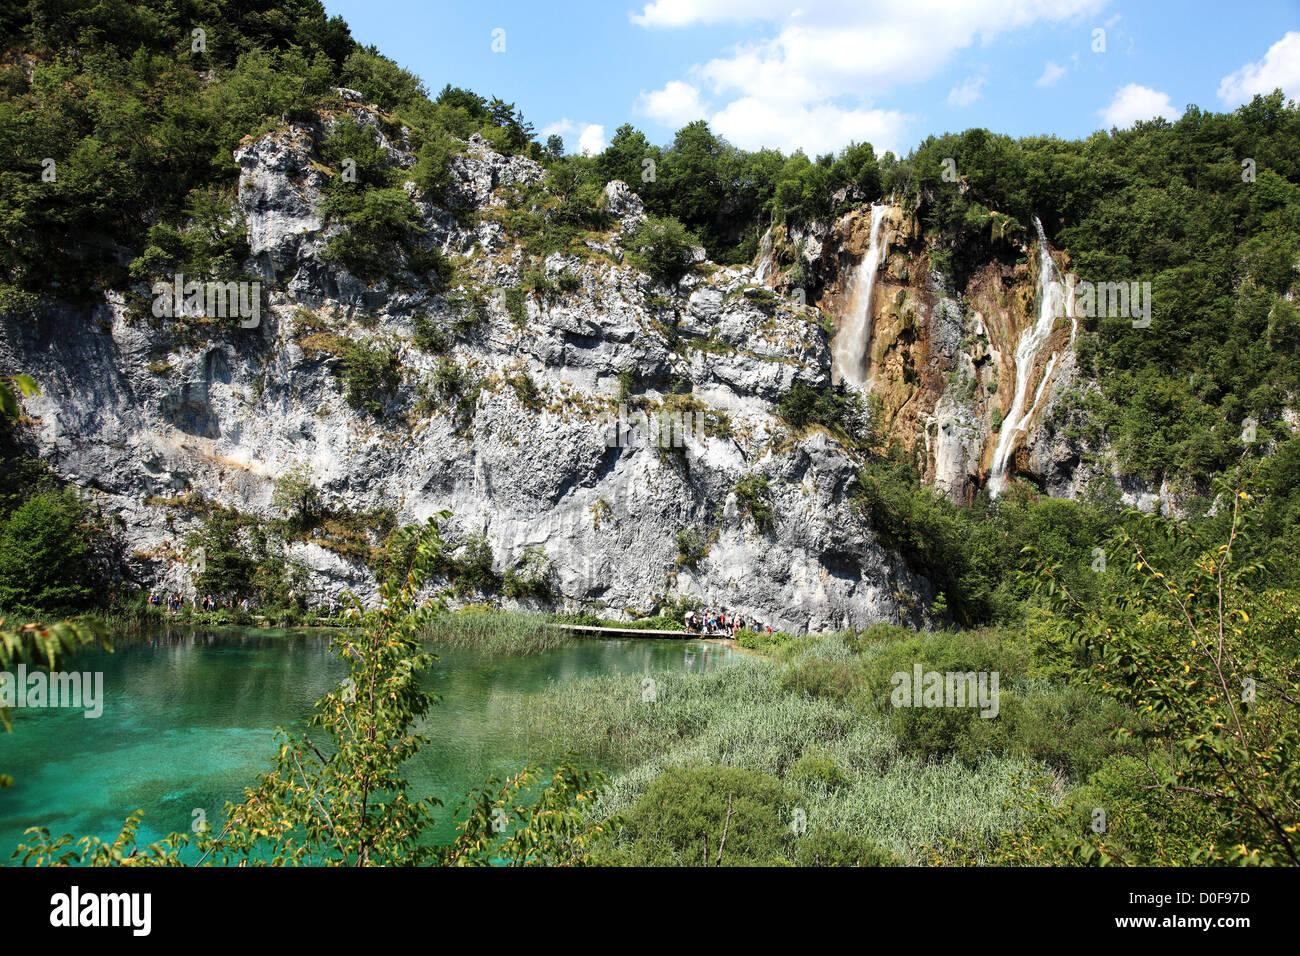 Plitvice National Park, Croatia - Stock Image